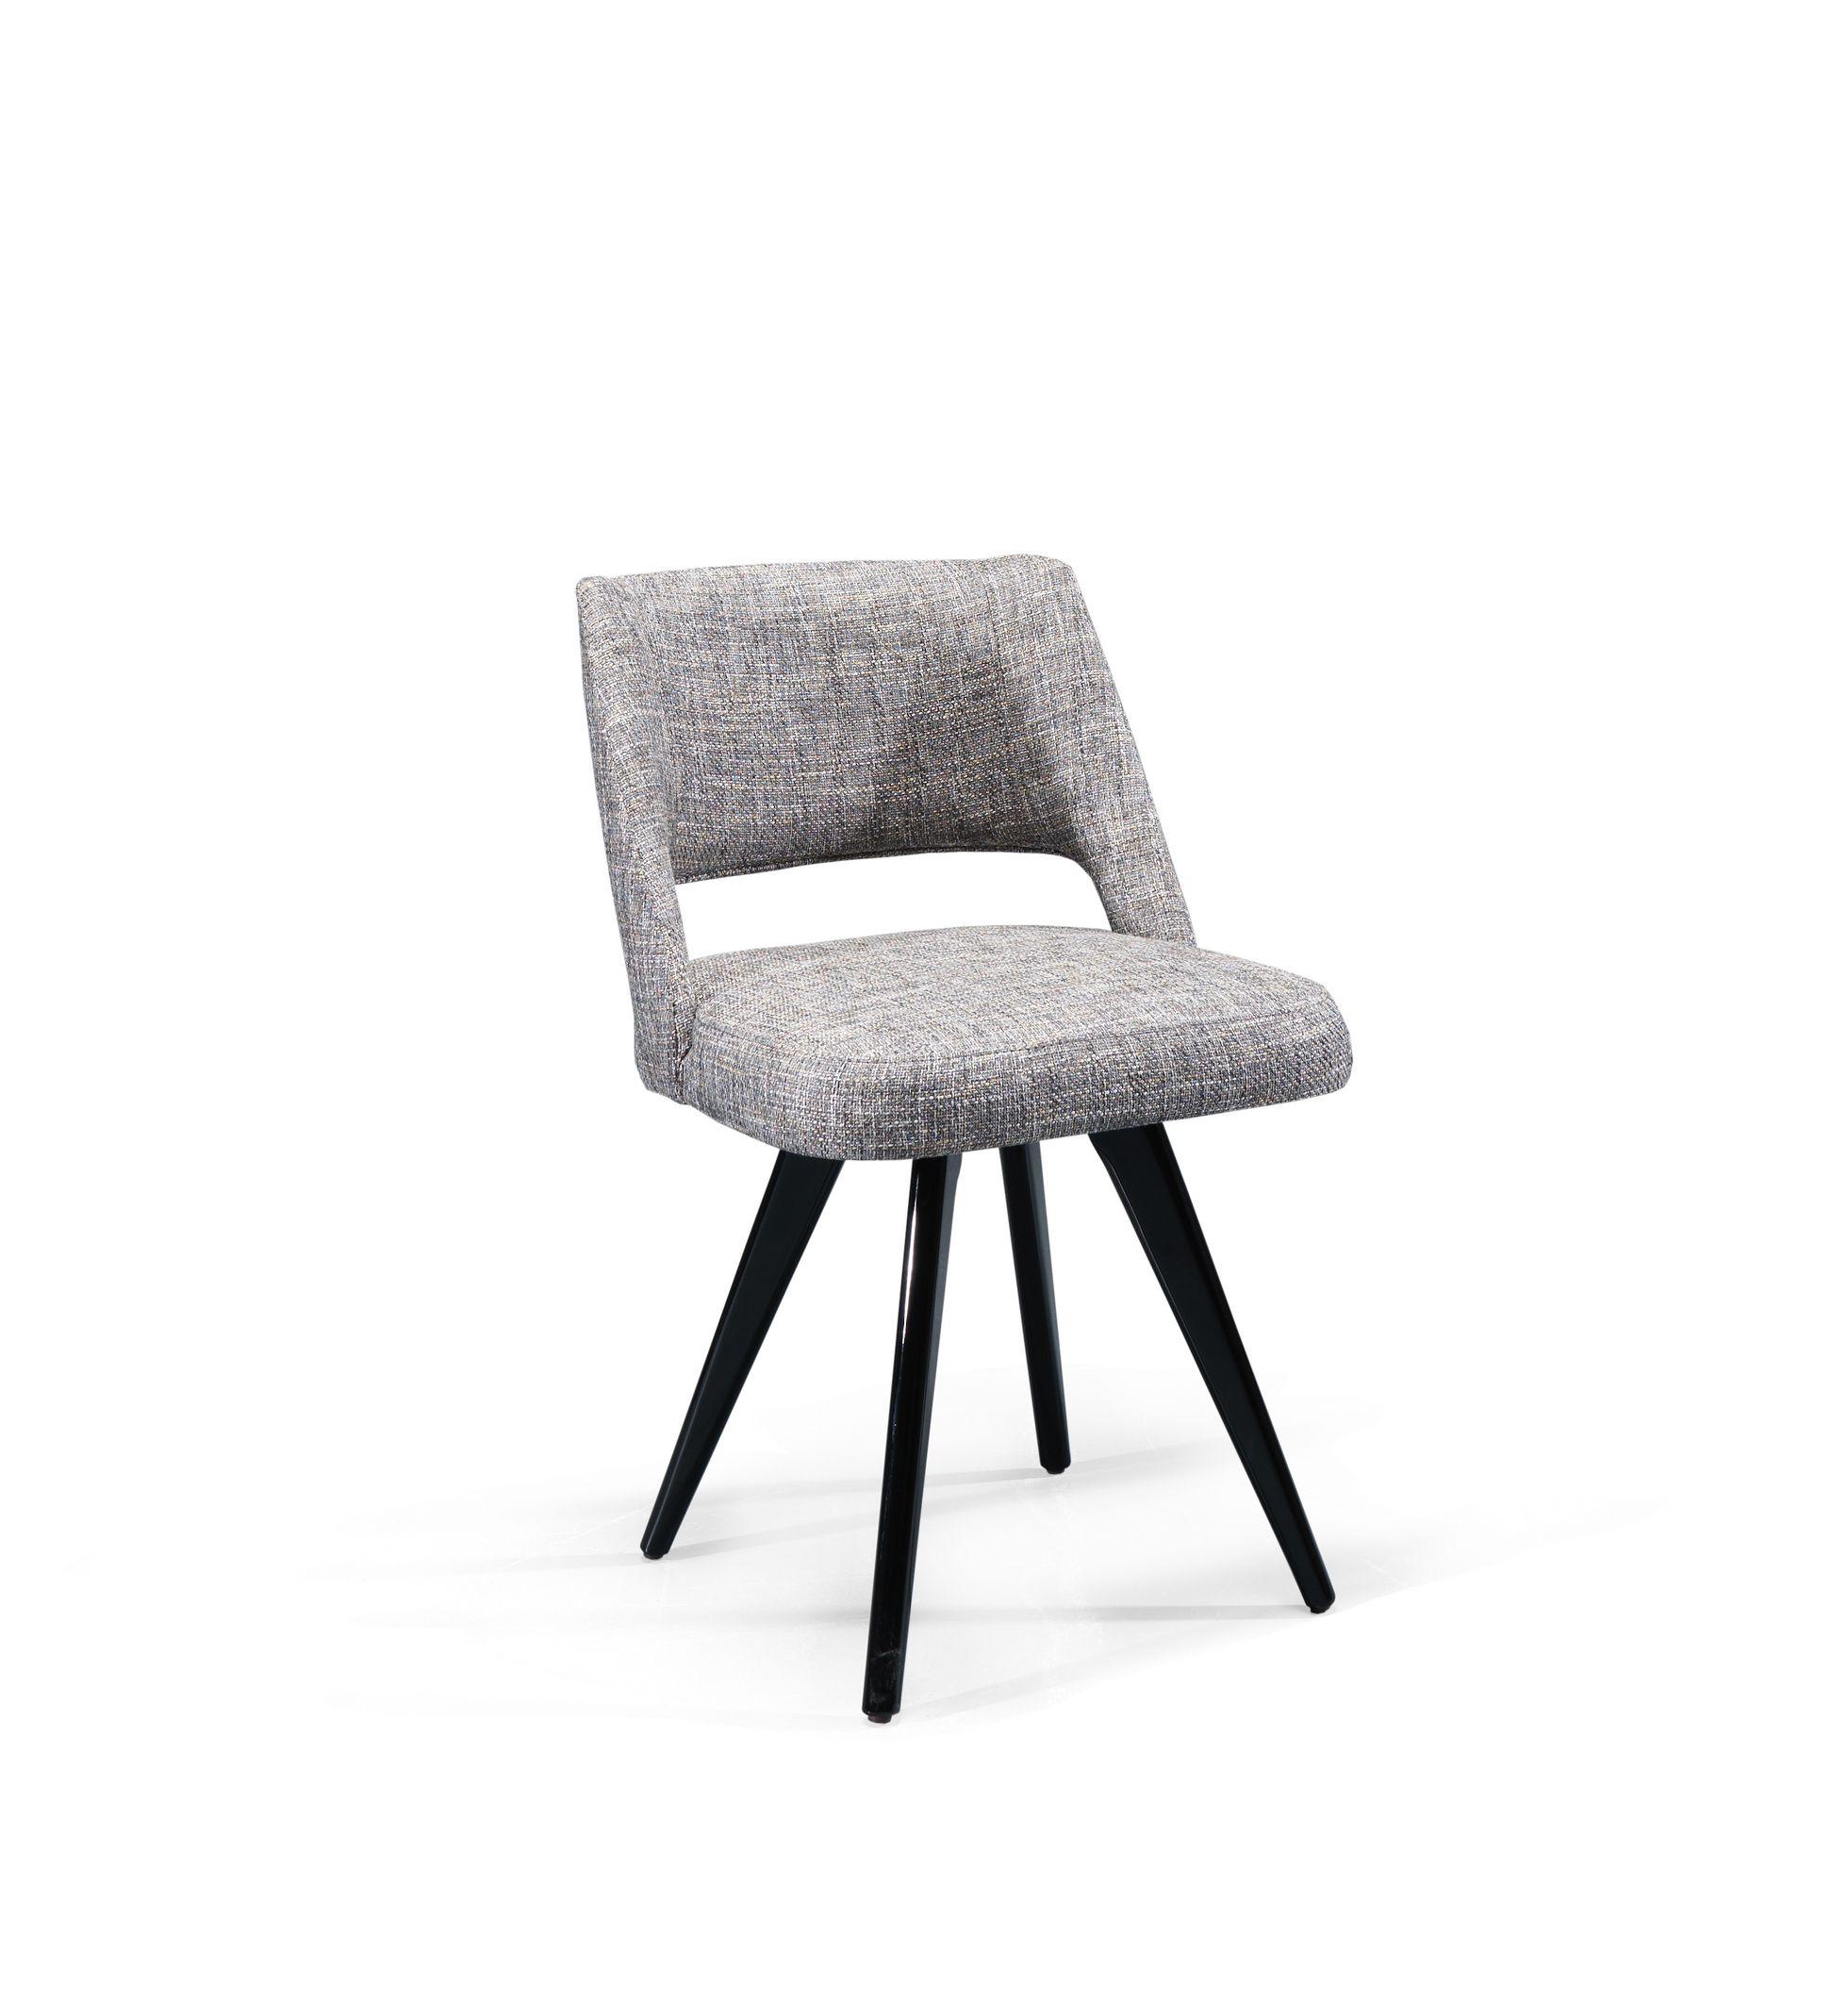 Laskasas Prestige Dining Chair Modern